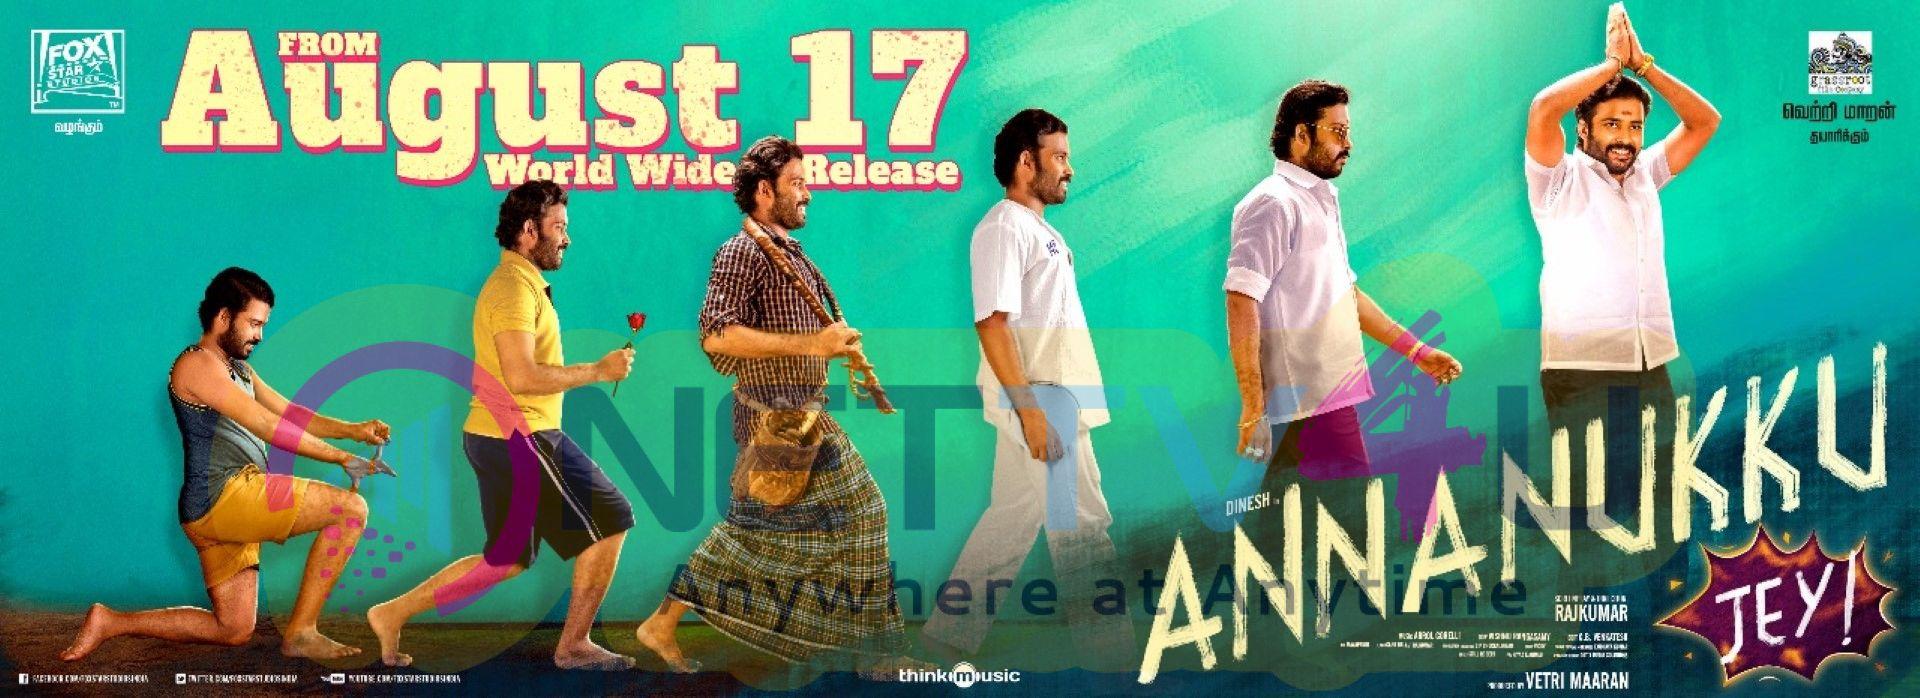 Annanukku Jai Tamil Movie Releasing Worldwide On 17th August Exclusive Posters Tamil Gallery